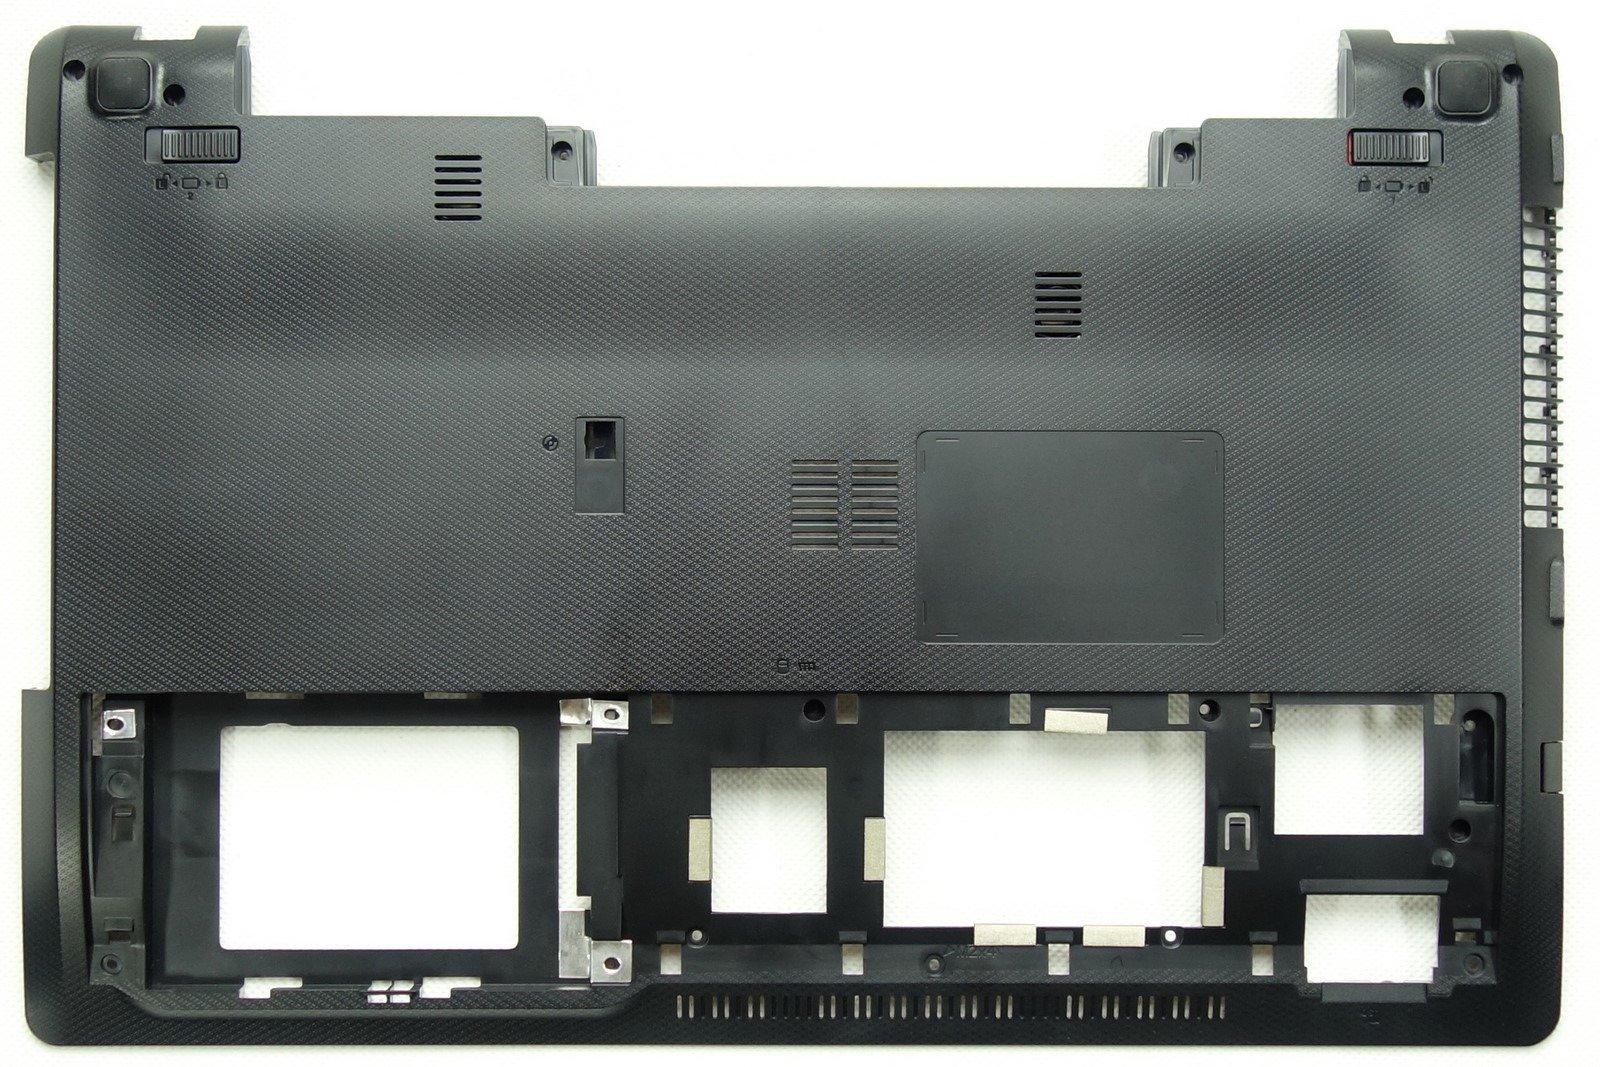 Spiksplinternieuw Obudowa dolna do laptopa Asus K55 A55 R500V K55V K55A U57A GY-68